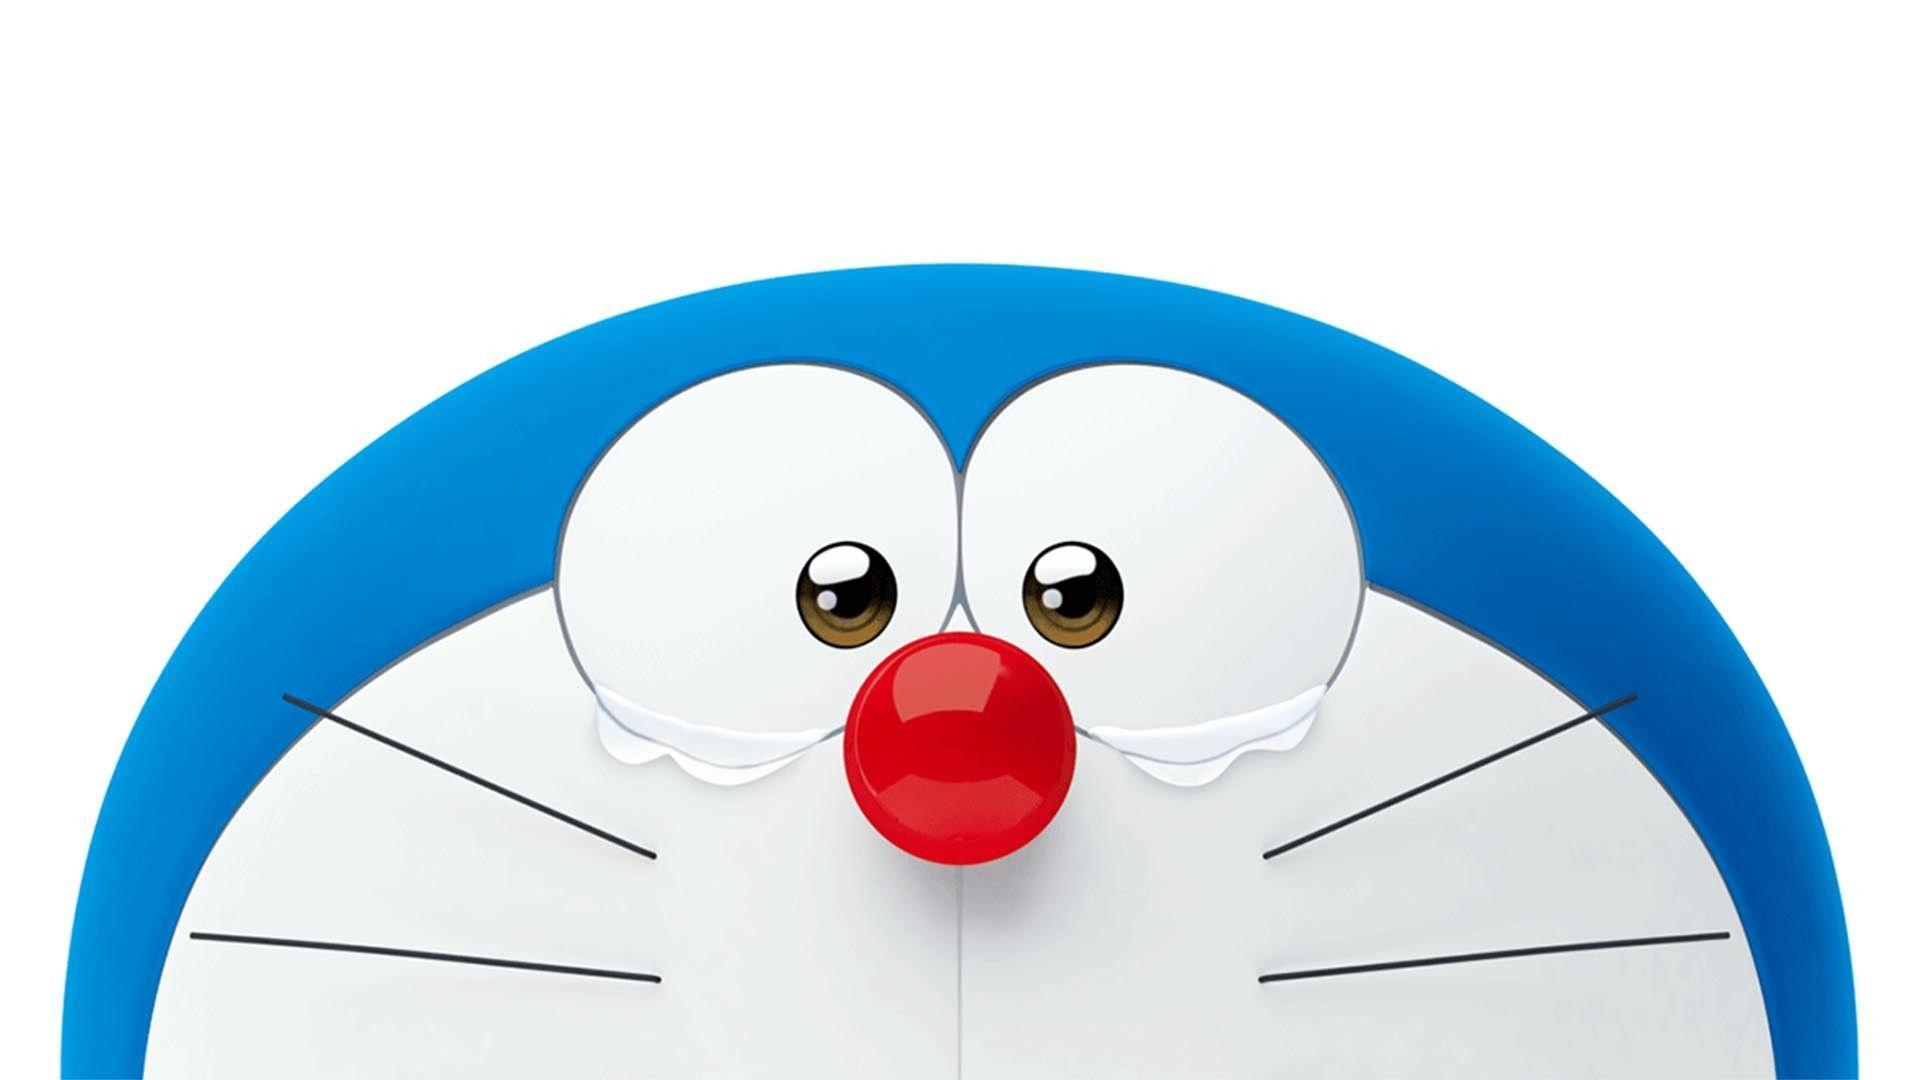 1920x1080 hình nền Doraemon